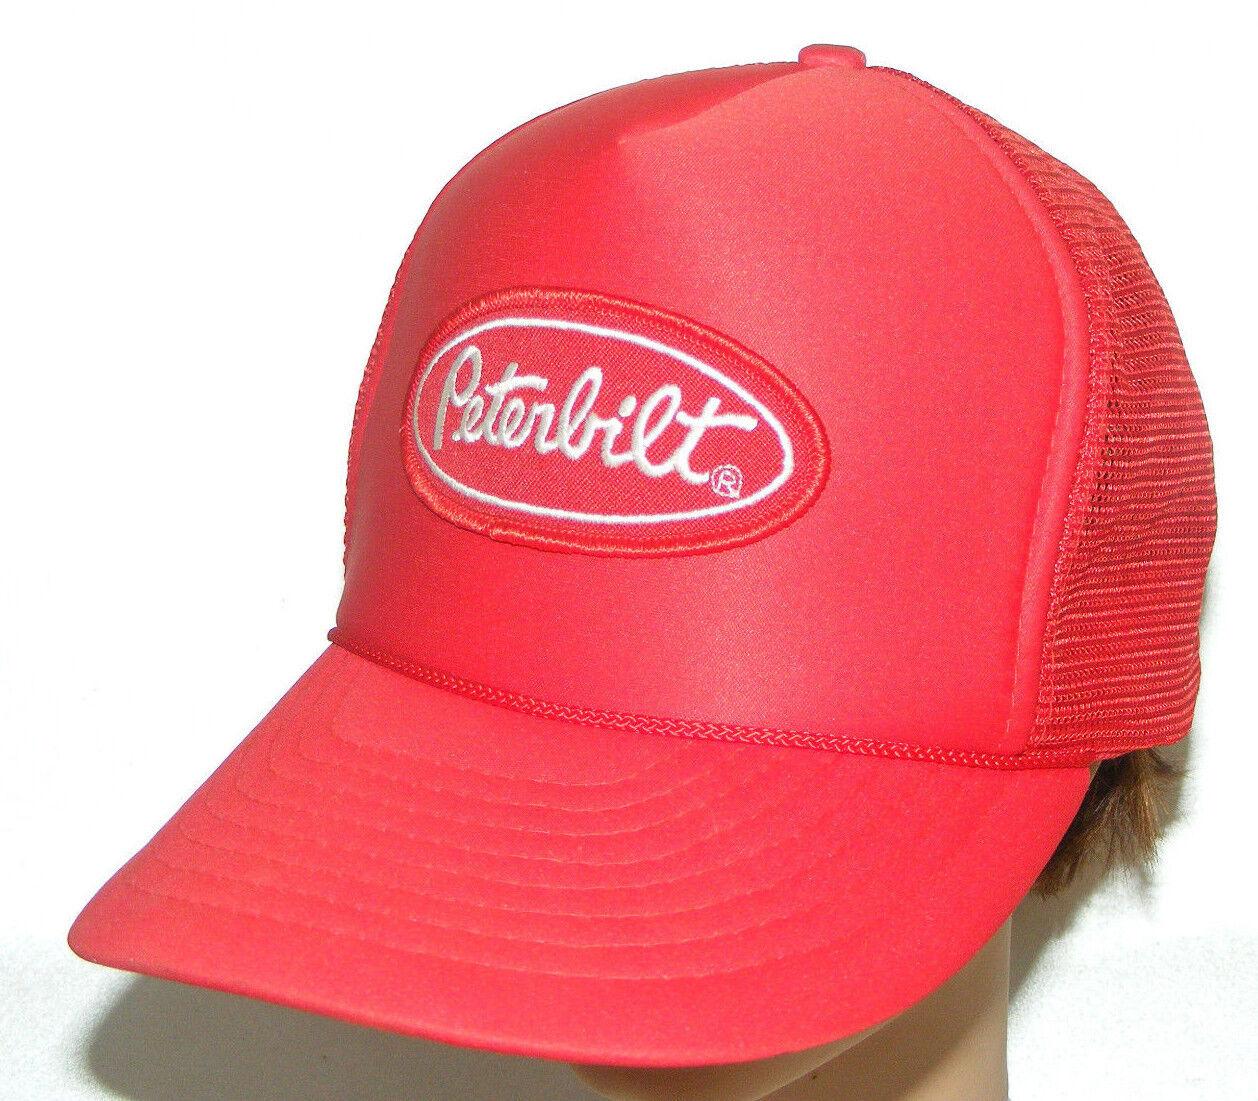 Vintage Peterbilt Snapback Trucker Mesh Red Cap Ha